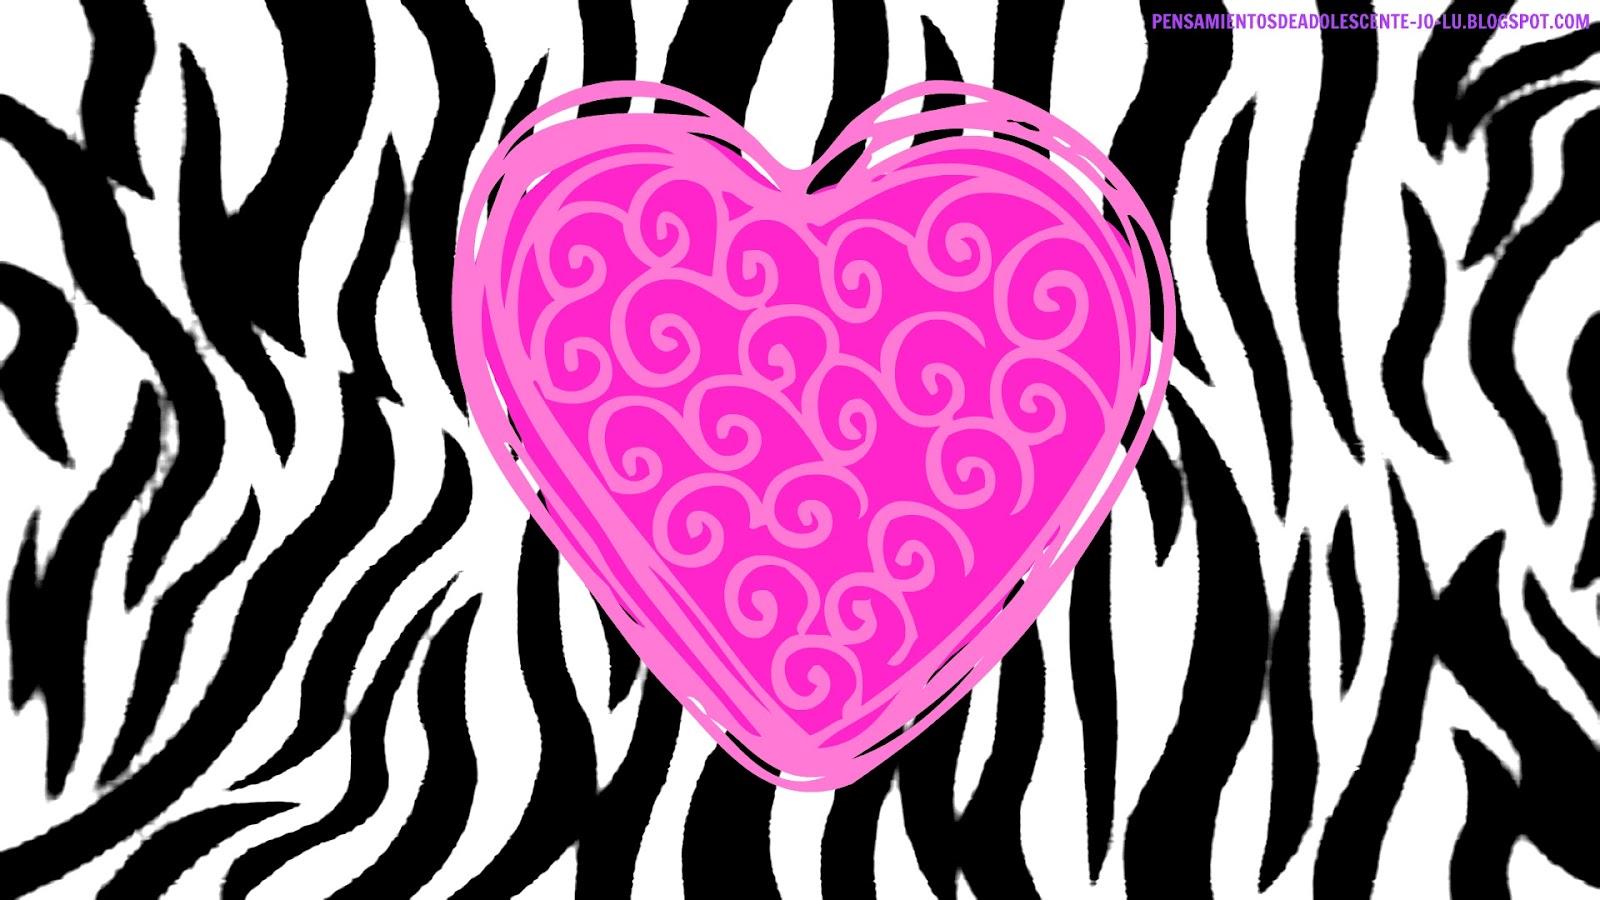 http://1.bp.blogspot.com/-hG-EdhxXJpQ/UDBAMxdVuvI/AAAAAAAABII/X4Y0nEGhz0o/s1600/JOLU-WALLPAPER-CORAZON-ANIMALSPRINT-ZEBRA-CHIC-CUTE-FASHION-SEXY.jpg